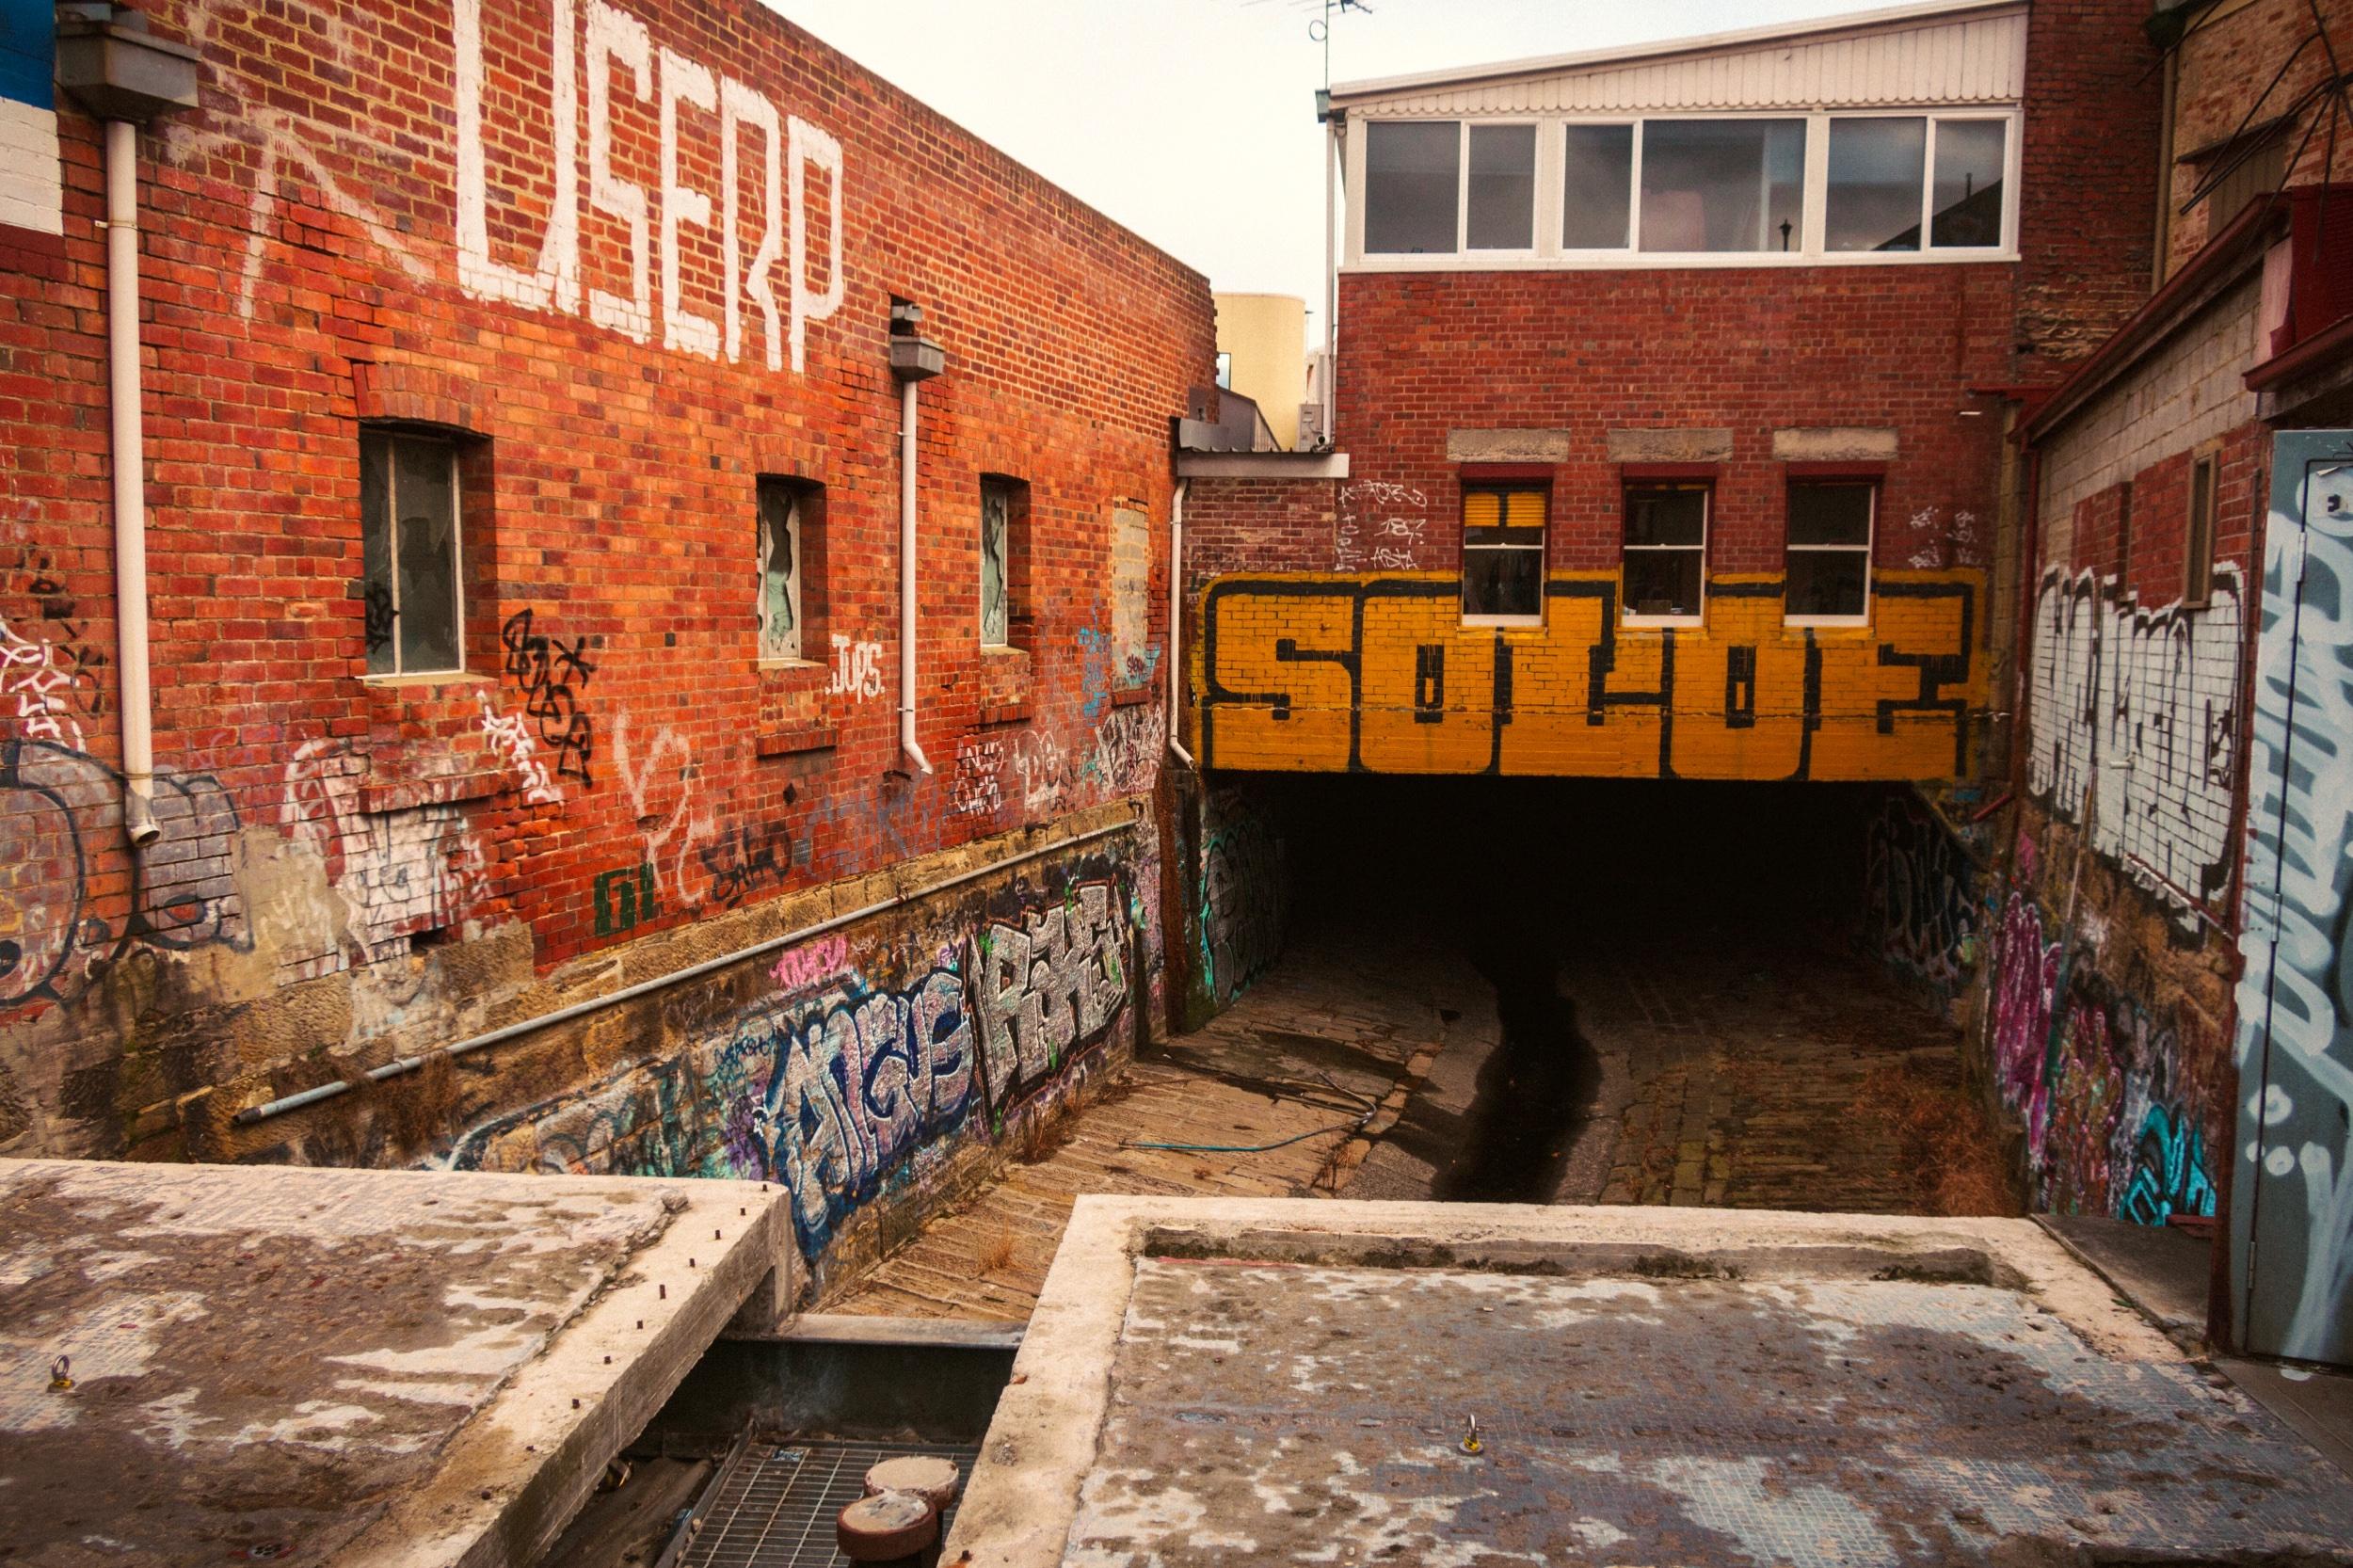 Graff in the rivo | G9X II